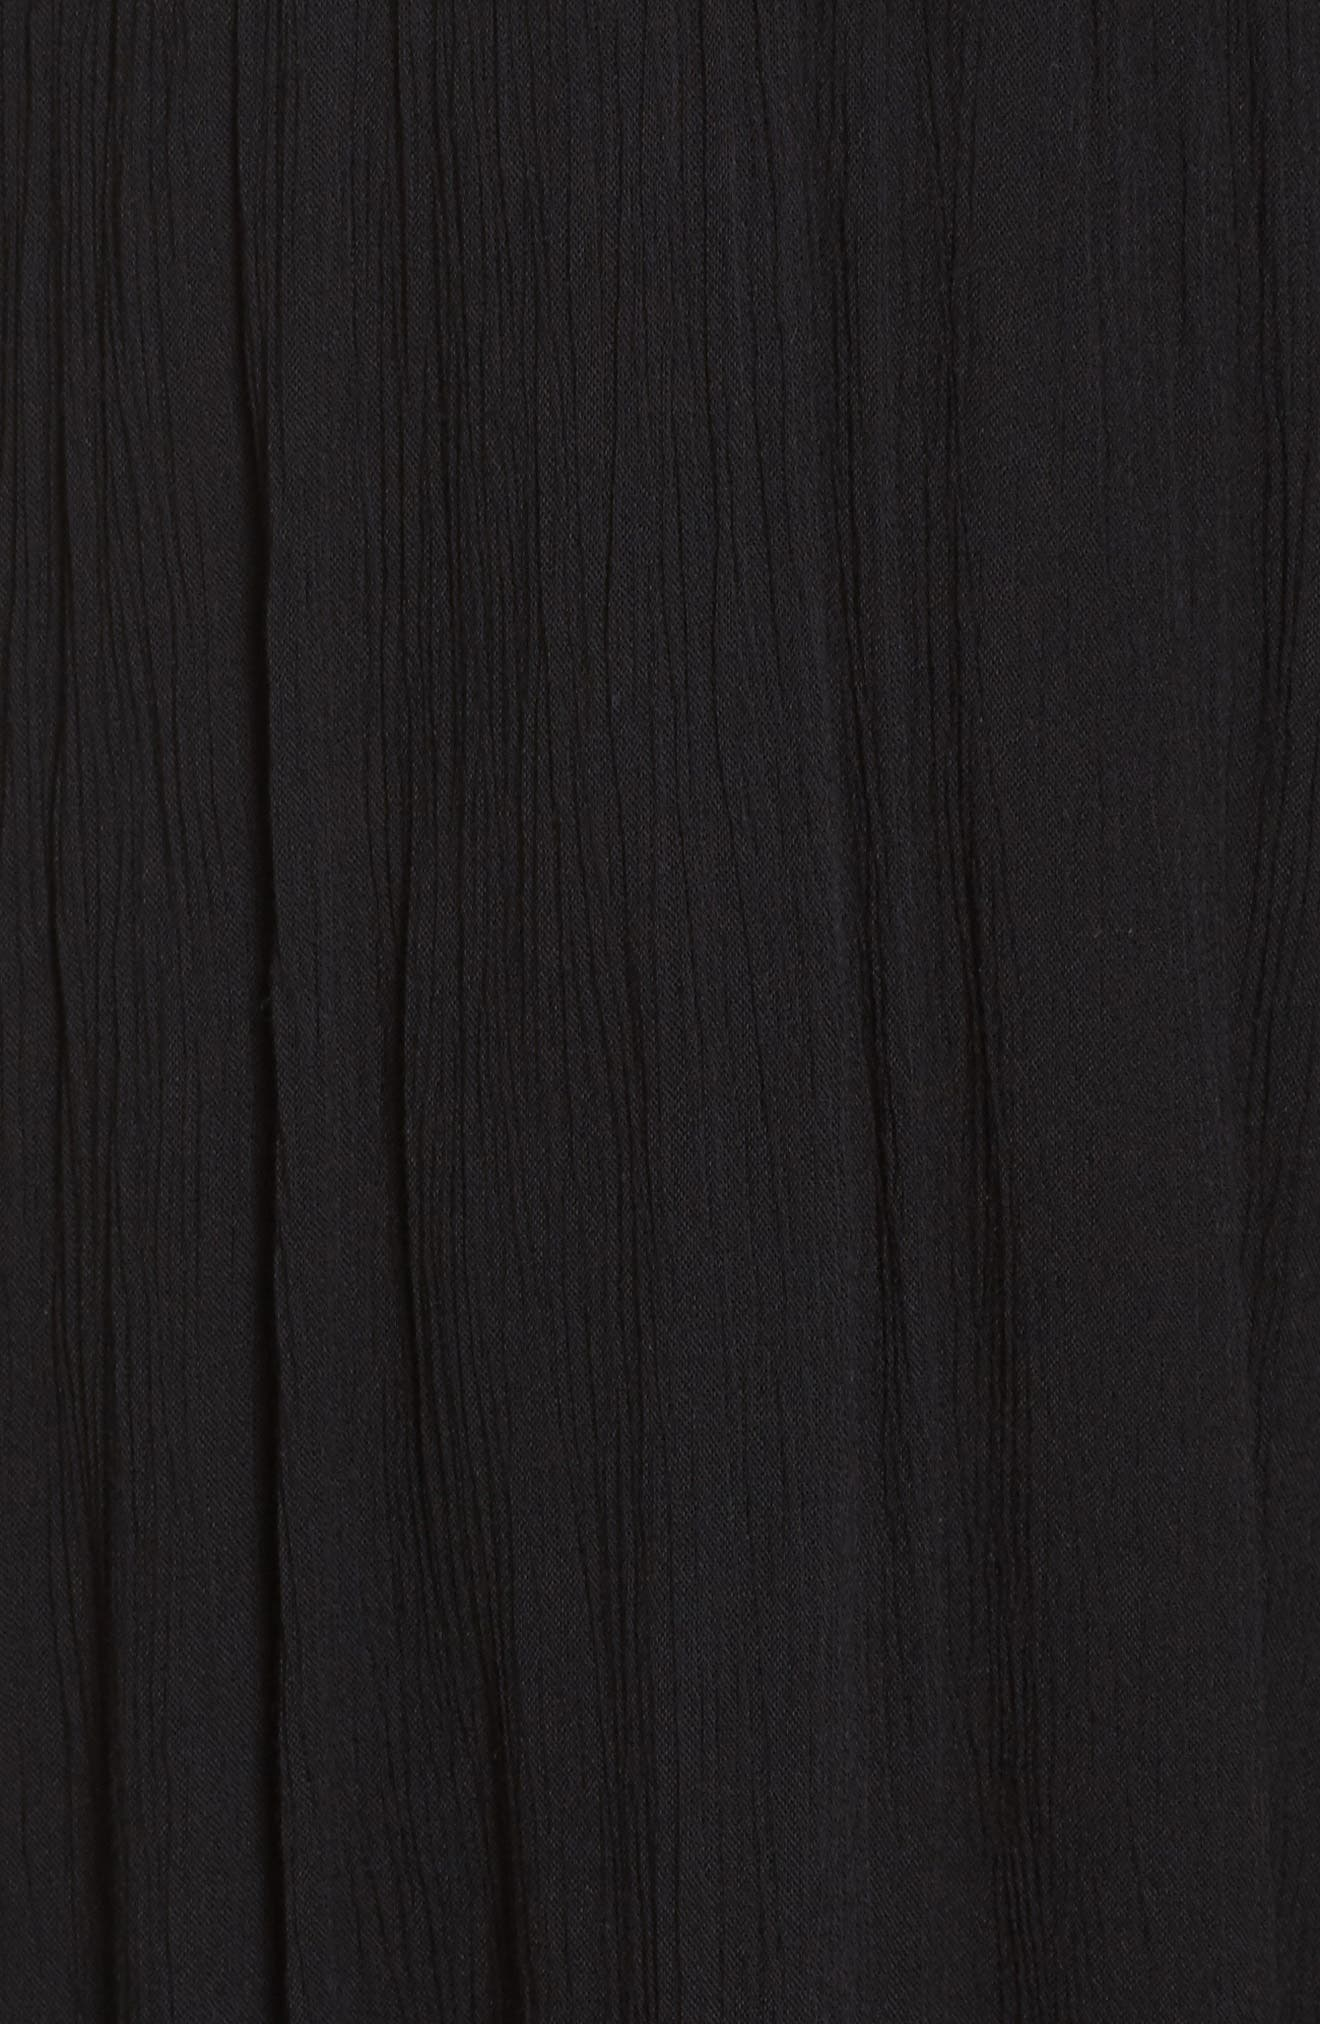 Smocked Off-the-Shoulder Cover-Up Maxi Dress,                             Alternate thumbnail 5, color,                             Black